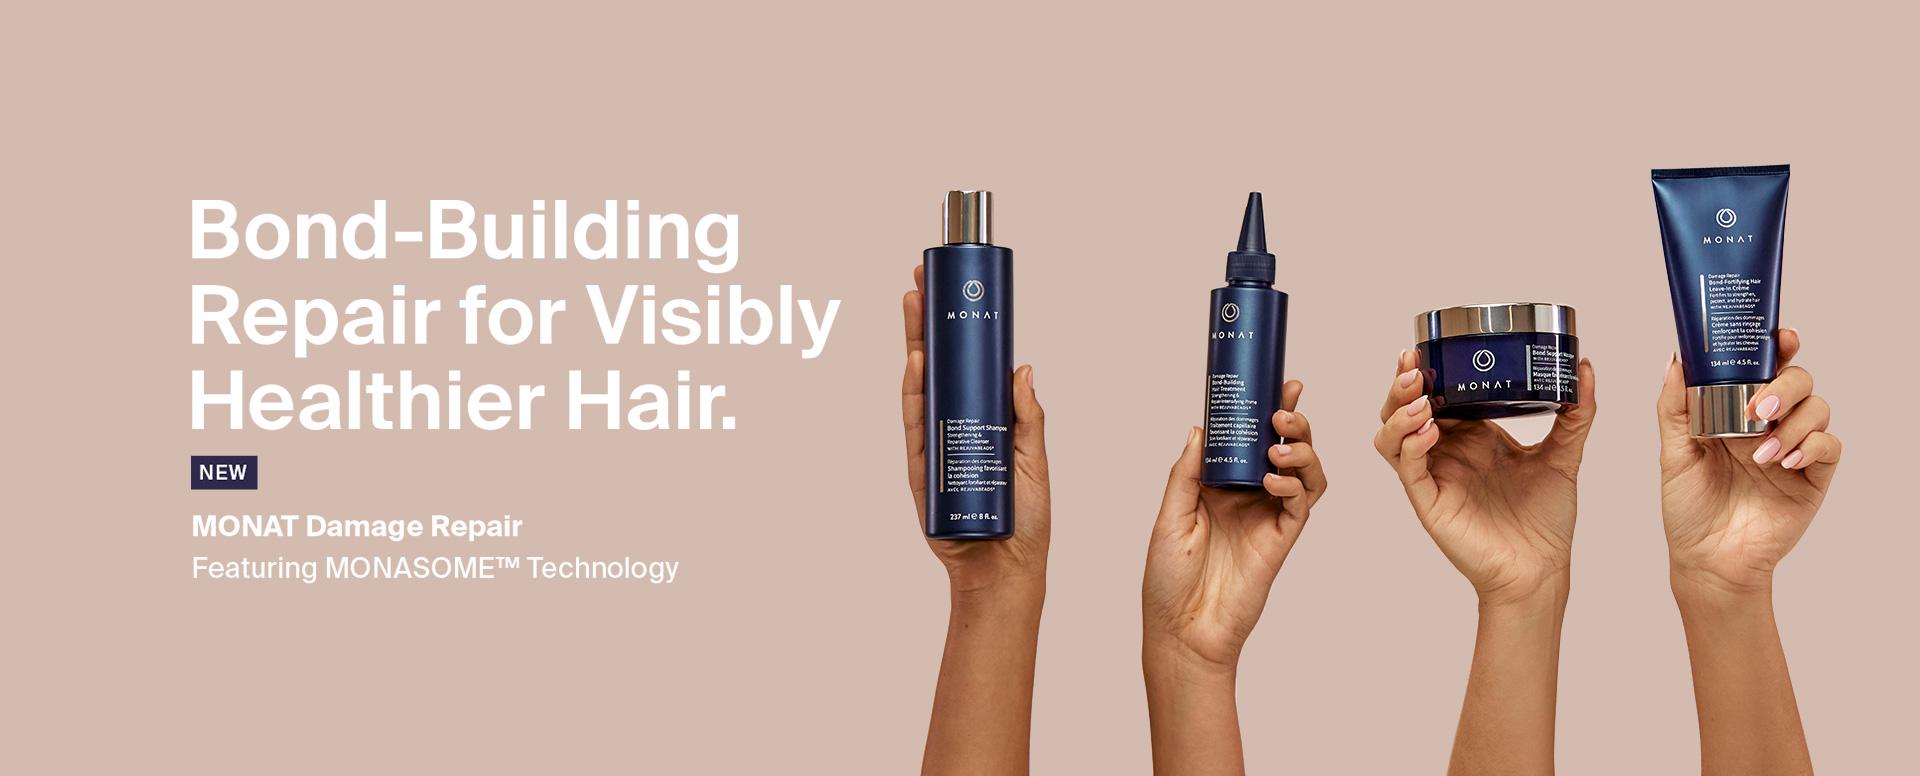 New Purifying Haircare, Scalp Purifying Scrub, Purifying Vinegar Shampoo